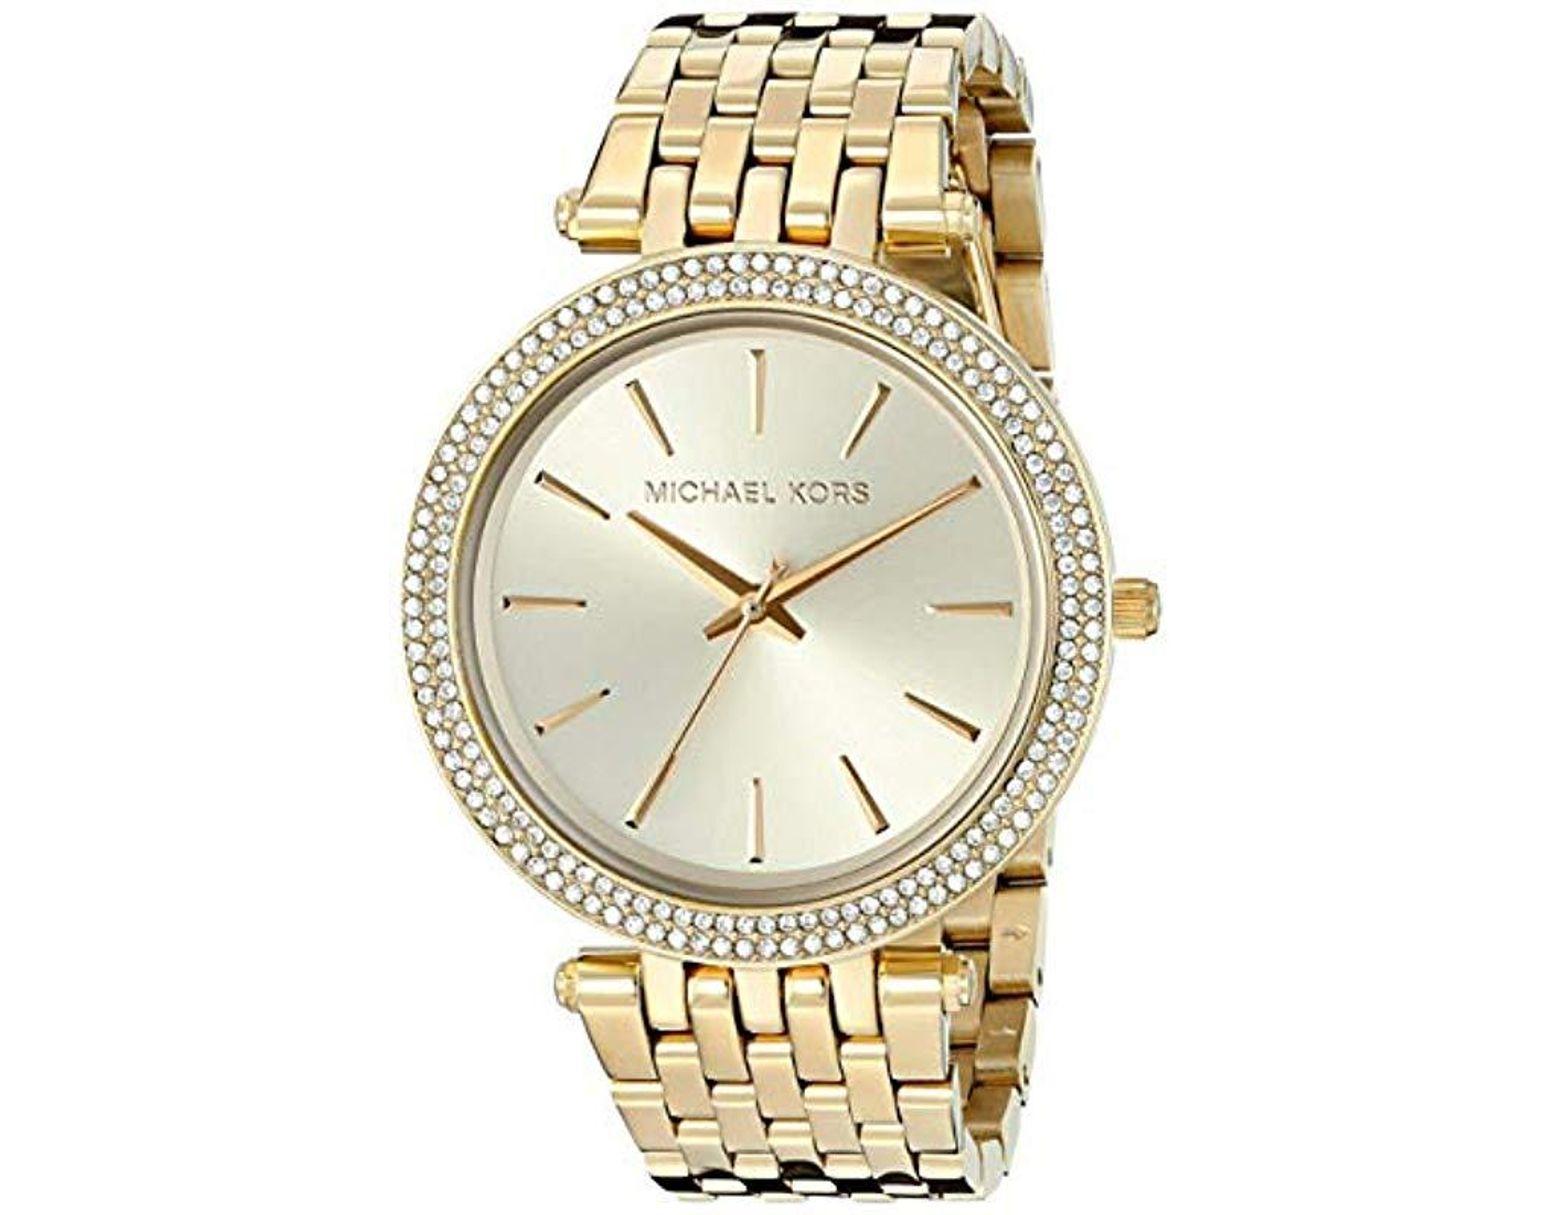 712618b85d79 Lyst - Michael Kors Darci Gold-tone Watch Mk3191 in Metallic - Save 17%